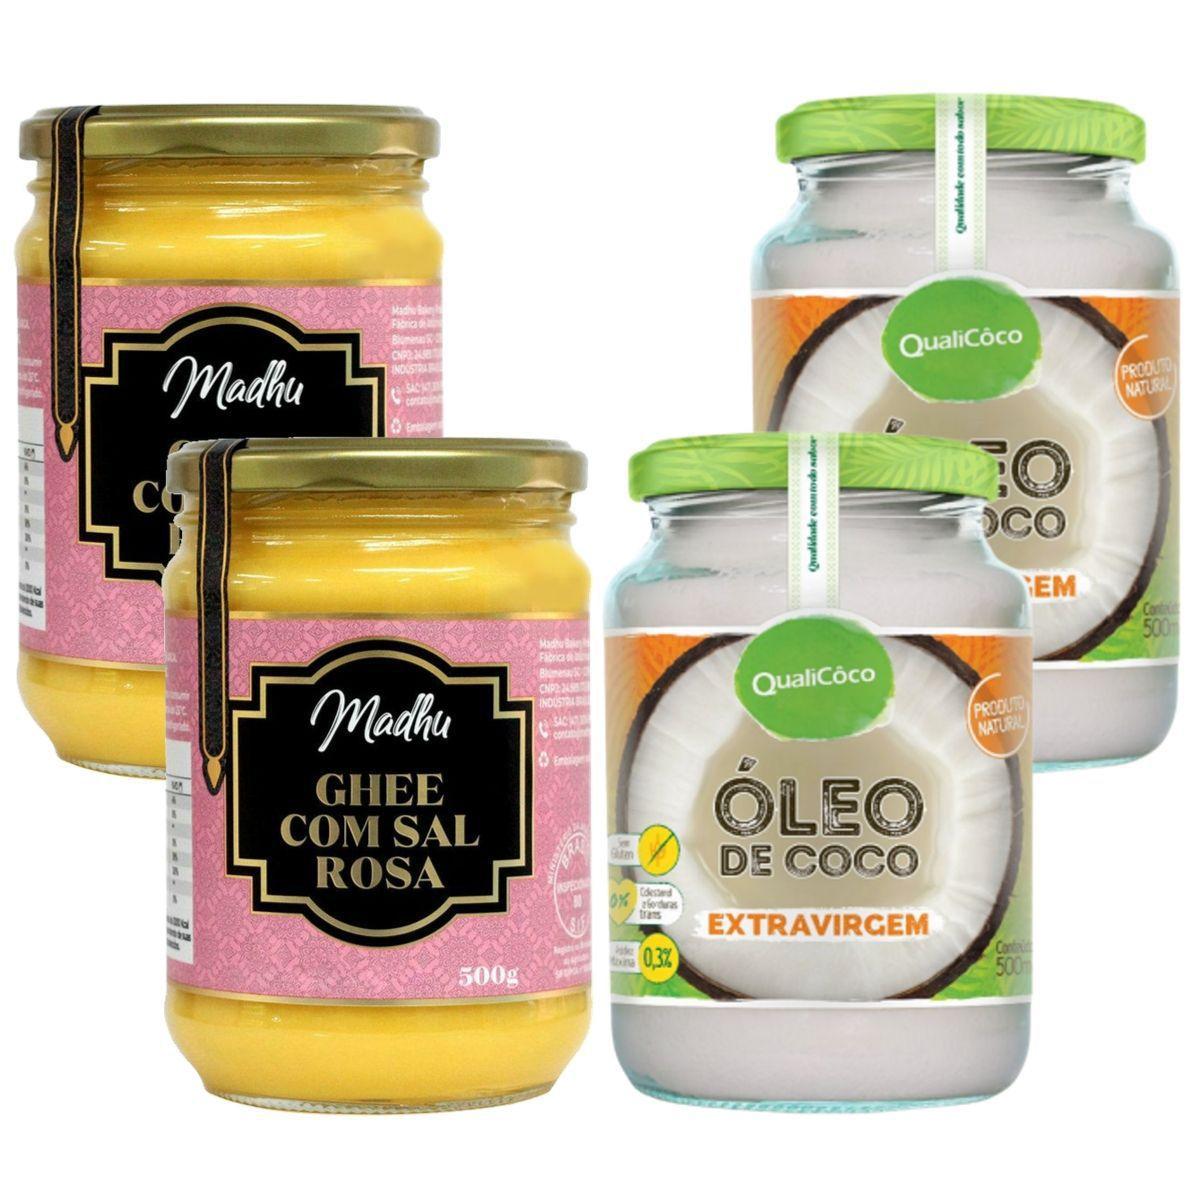 Kit 2 Oleo De Coco Extra Virgem 500ml + 2 Manteiga Ghee Clarificada C/ Sal Rosa do Himalaia 500ml